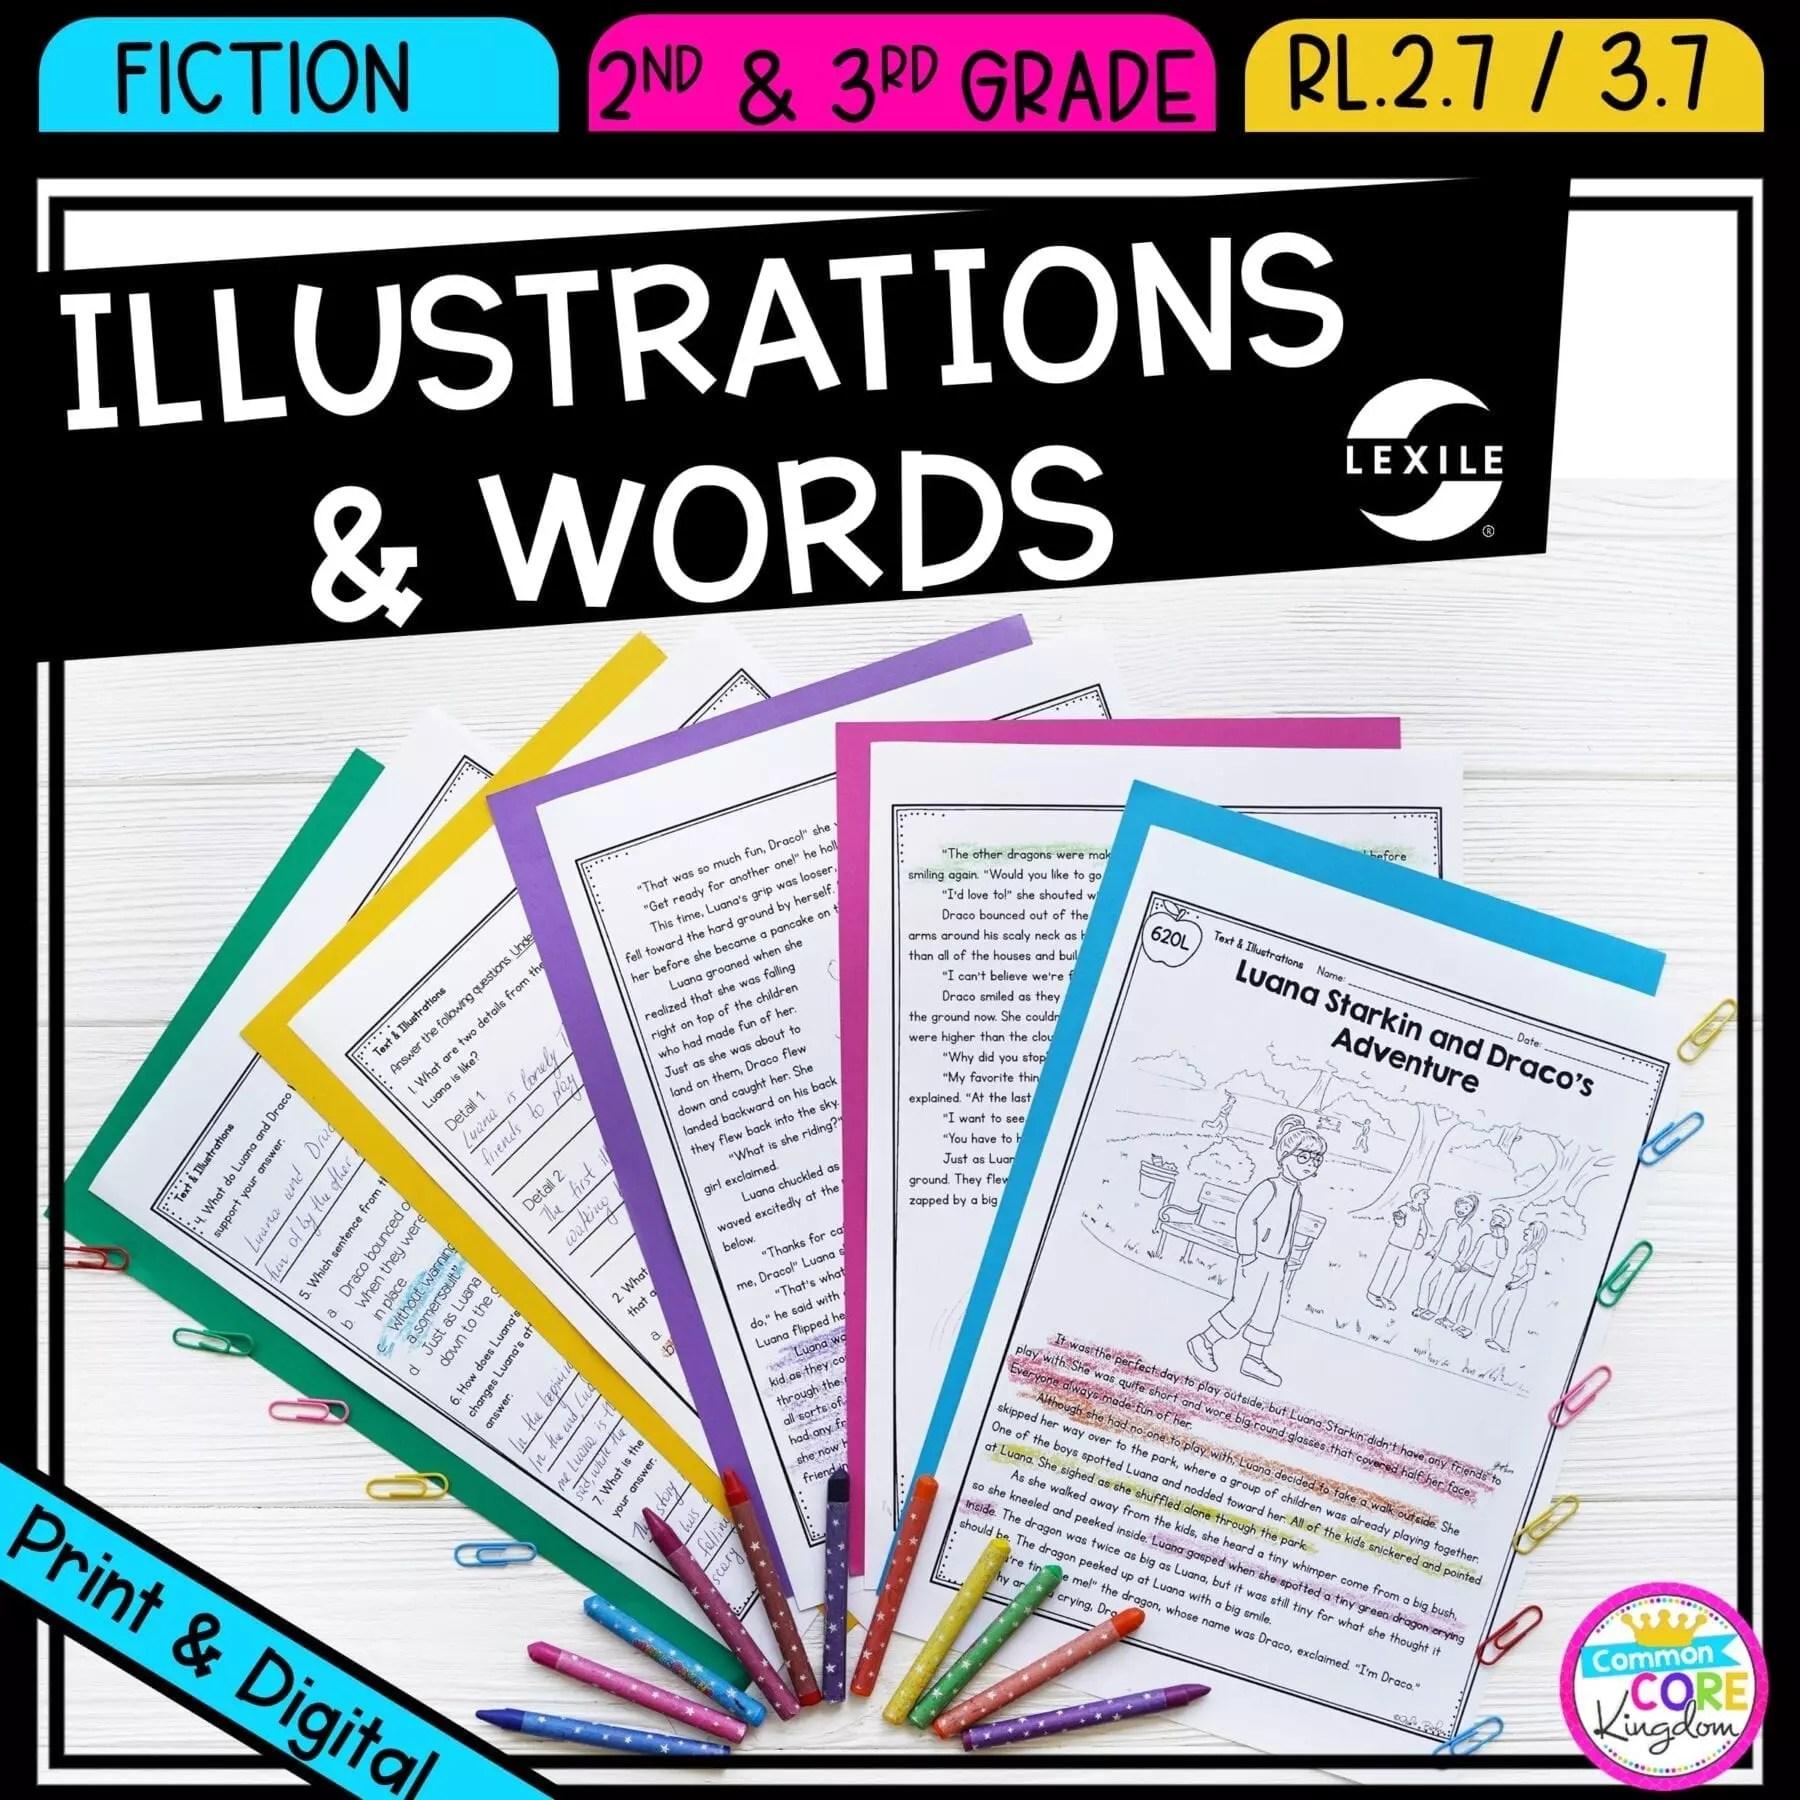 small resolution of Illustrations \u0026 Words RL.2.7 RL.3.7   Common Core Kingdom